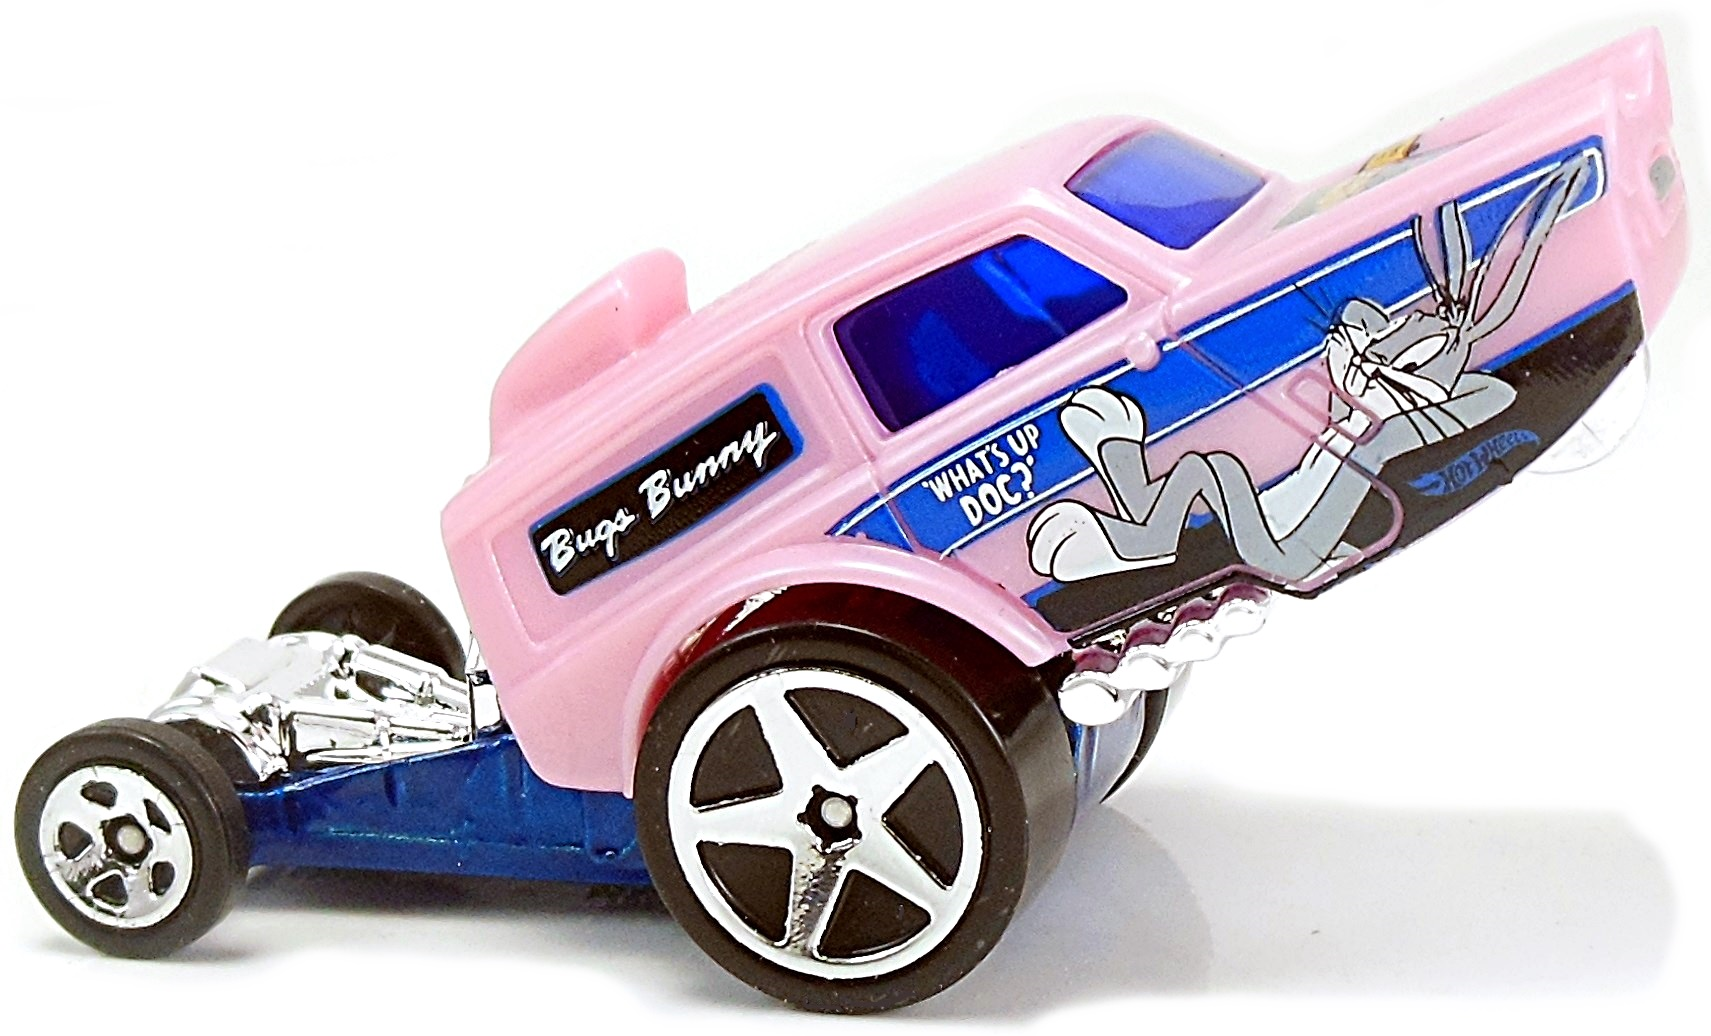 Hot Wheels Bugs Bunny Looney Tunes HW Poppa Wheelie